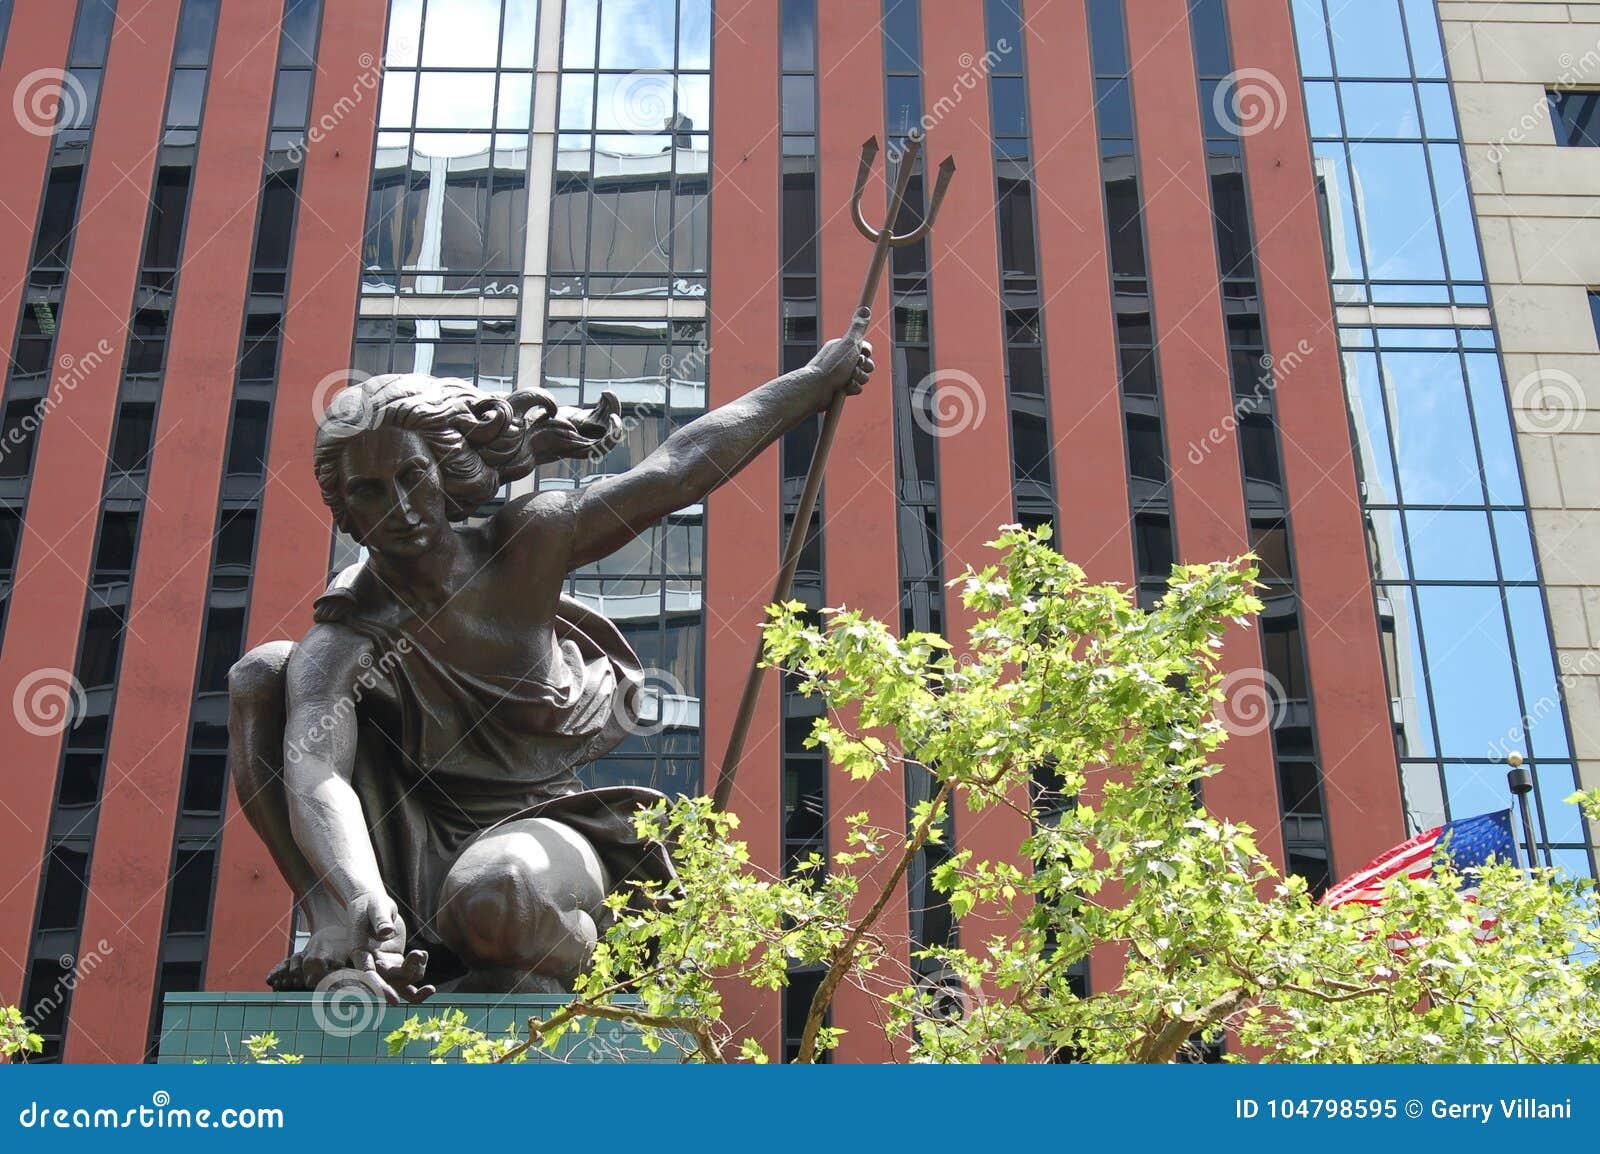 Statue of `Portlandia` in Portland, Oregon